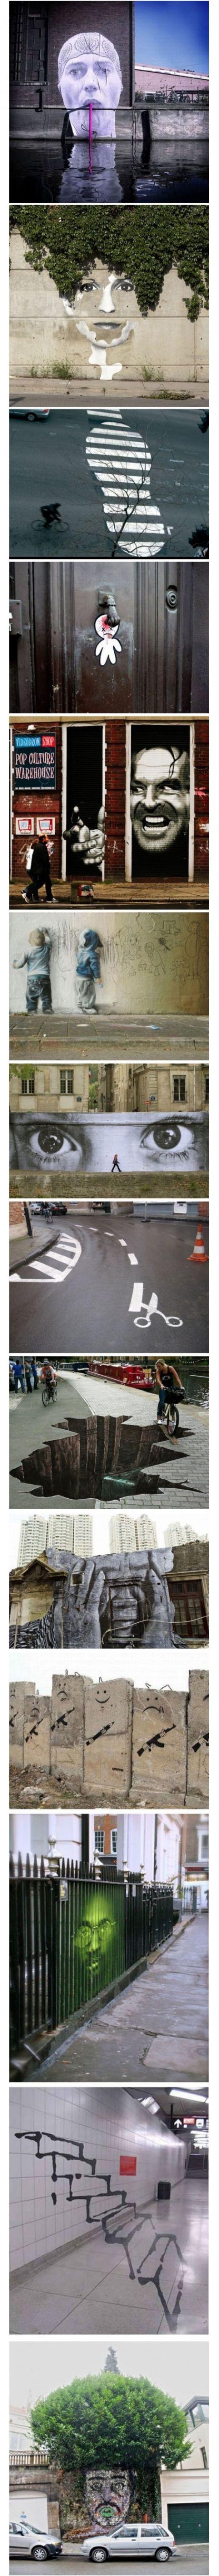 Street art done right!